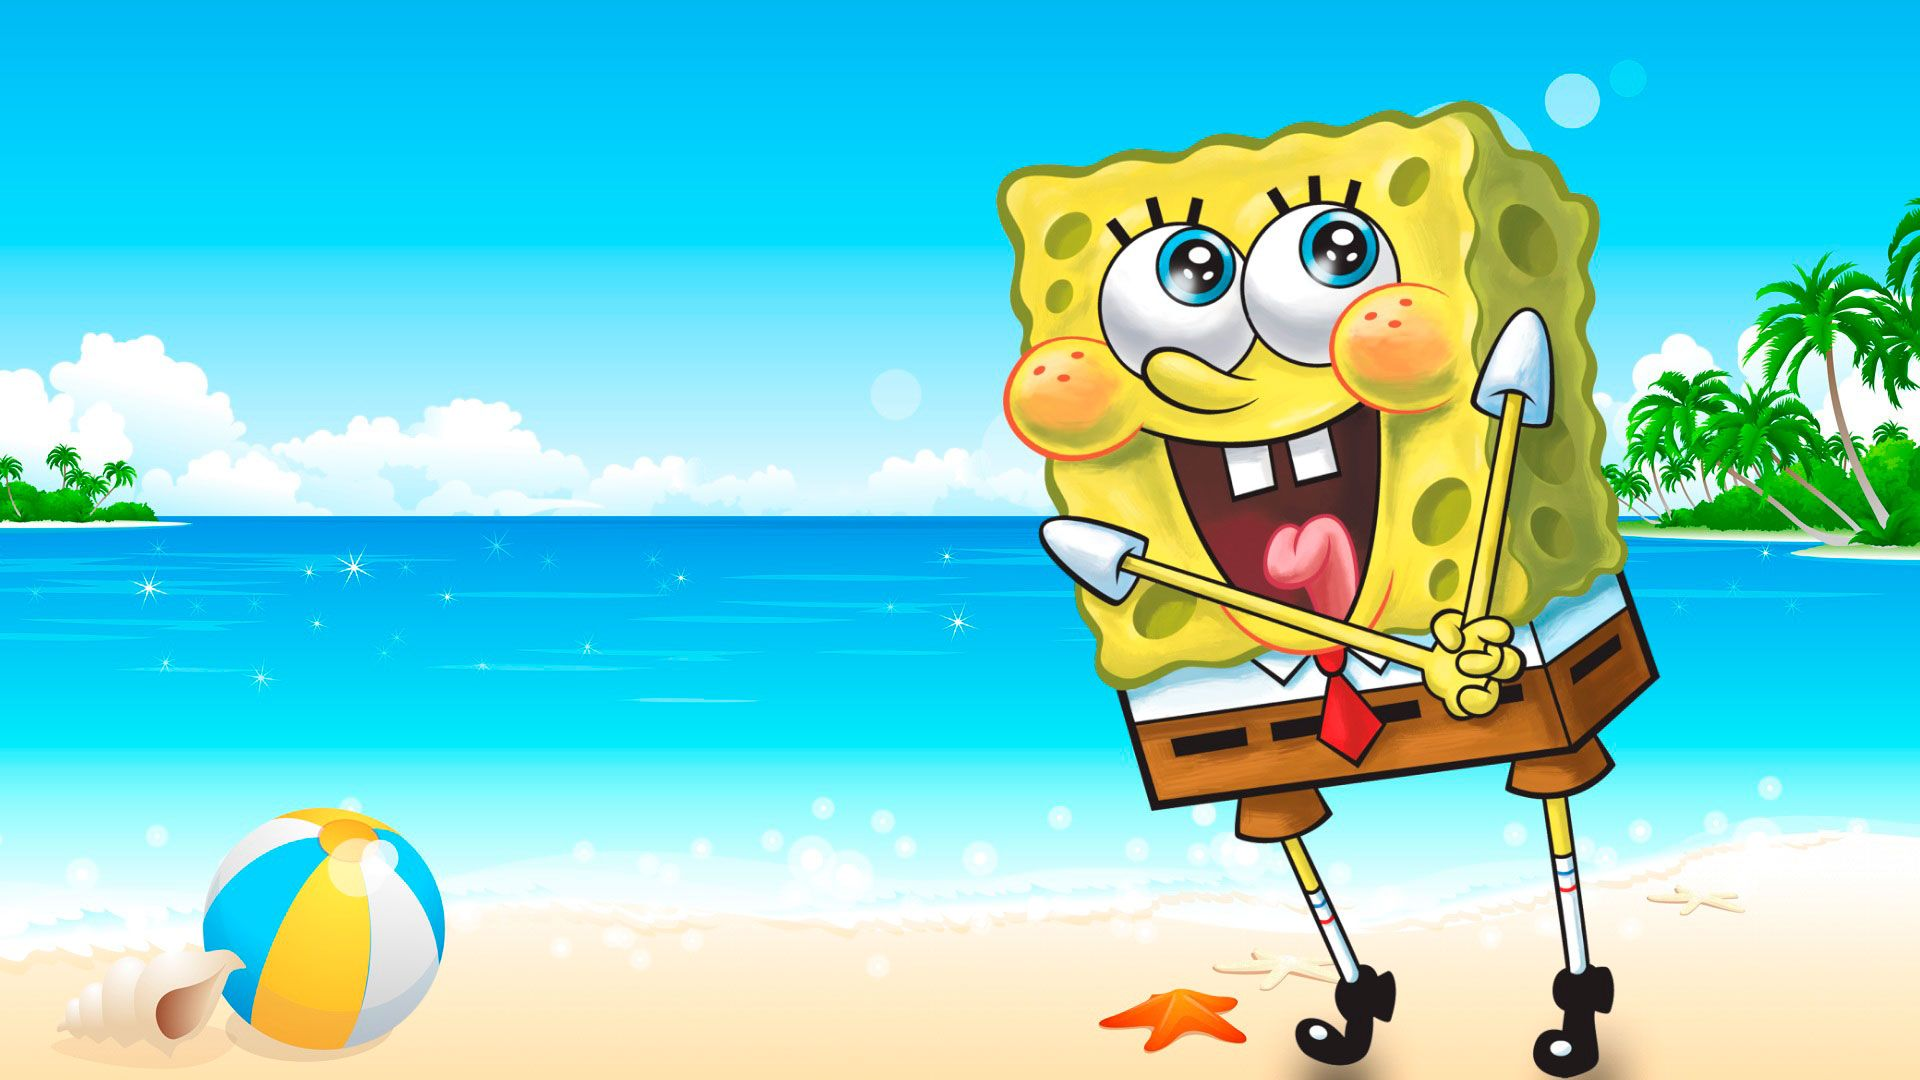 76+ Spongebob Backgrounds on WallpaperSafari